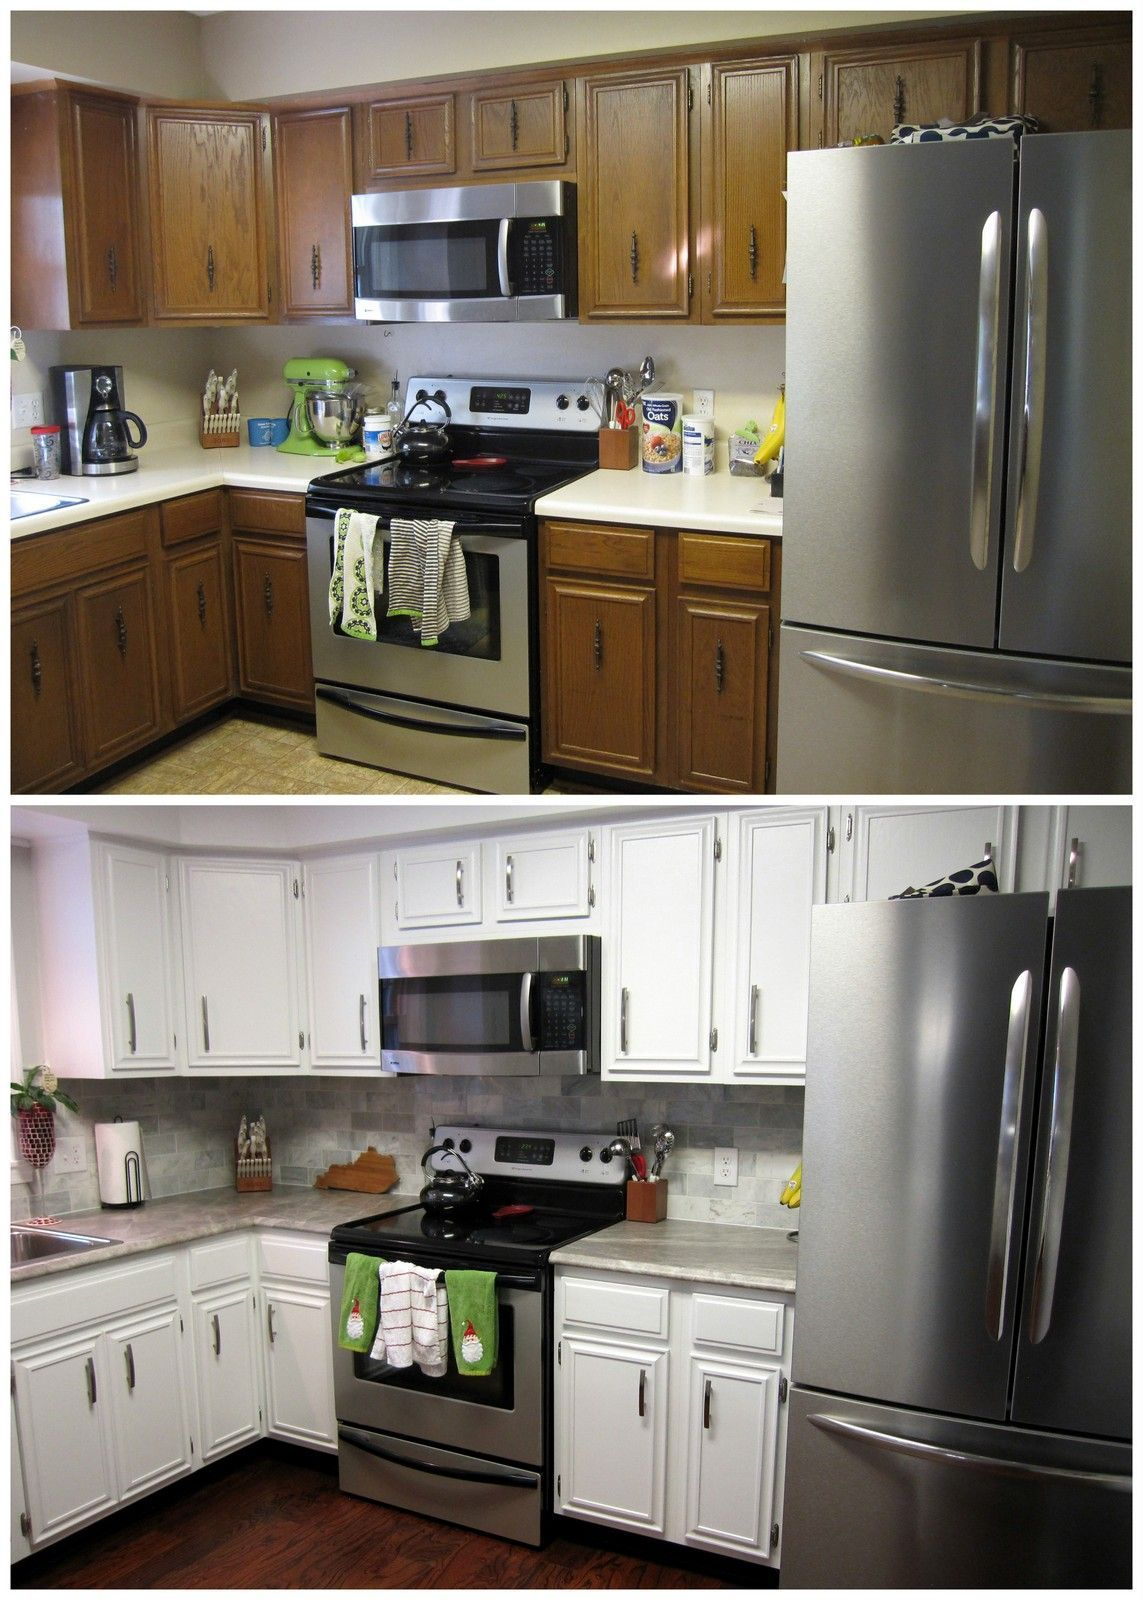 2019 Kitchen Cabinet Ratings Cabinet Kitchen Ratings In 2020 Kitchen Cabinets Rustic Kitchen Cabinets Kitchen Design